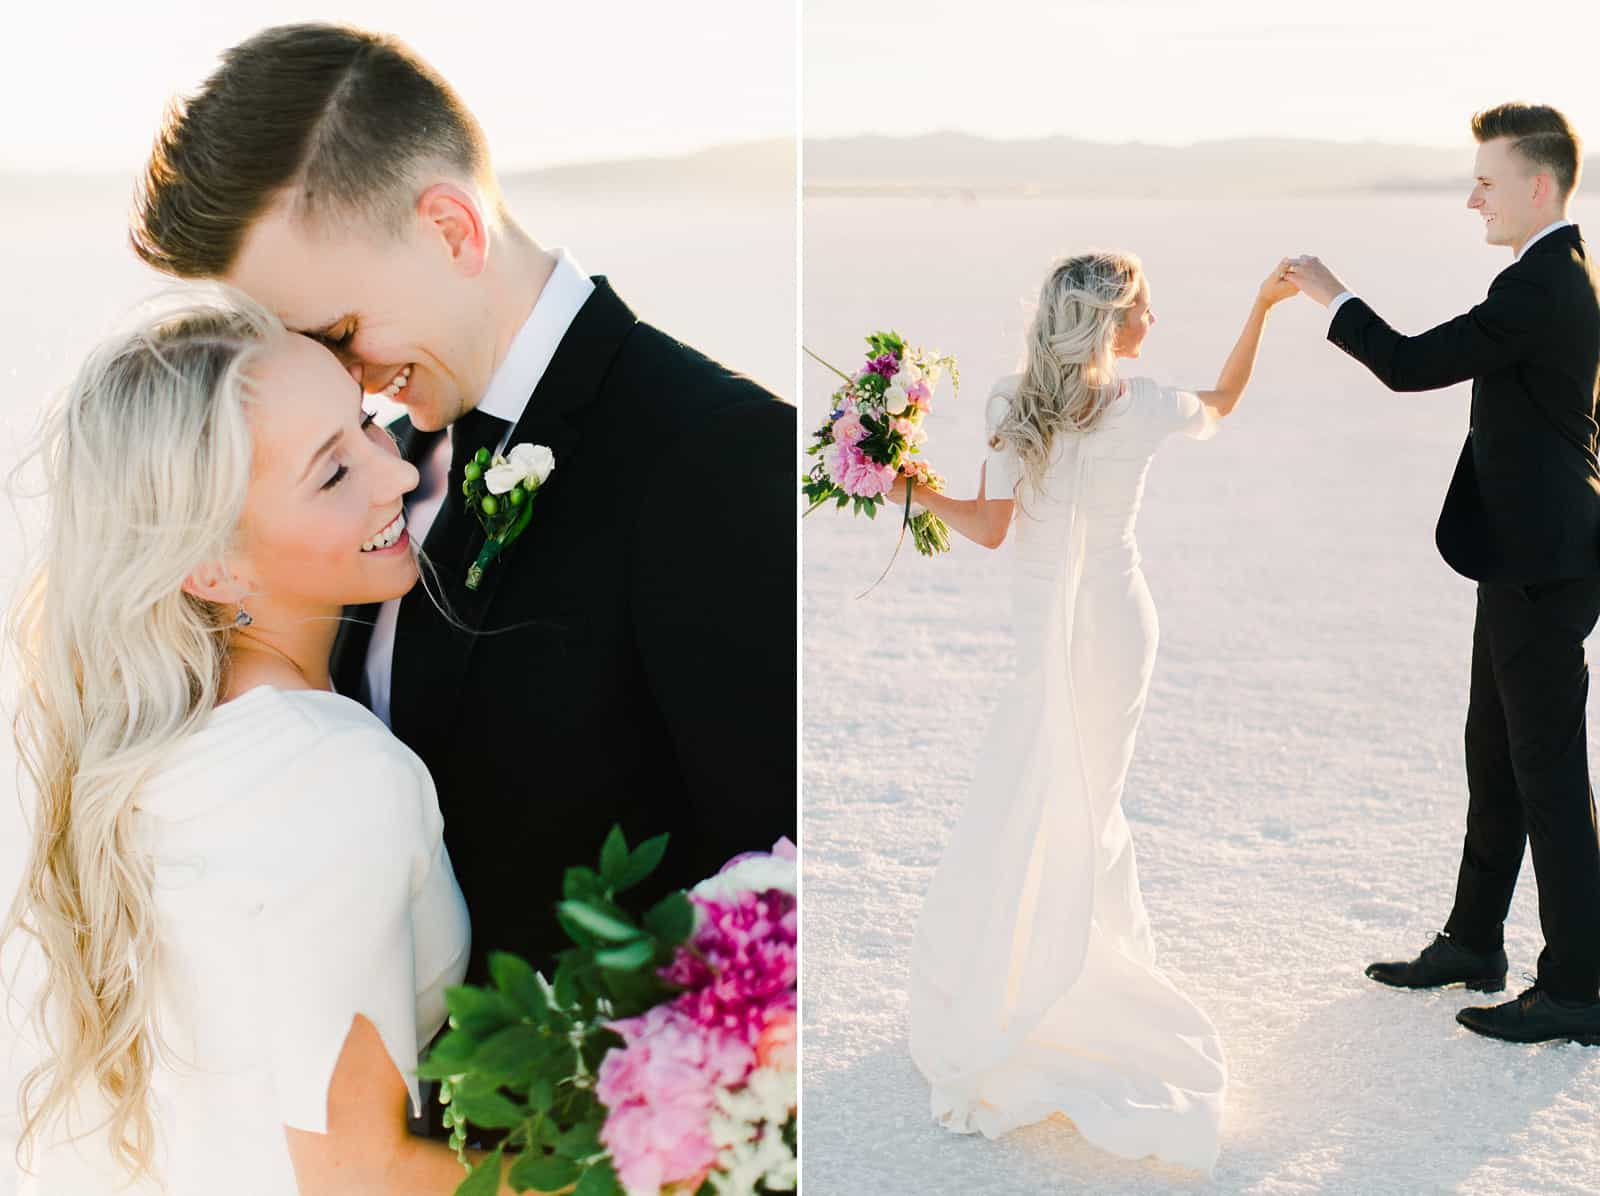 Bonneville Salt Flats Utah Wedding Photography, destination wedding, bride and groom dancing